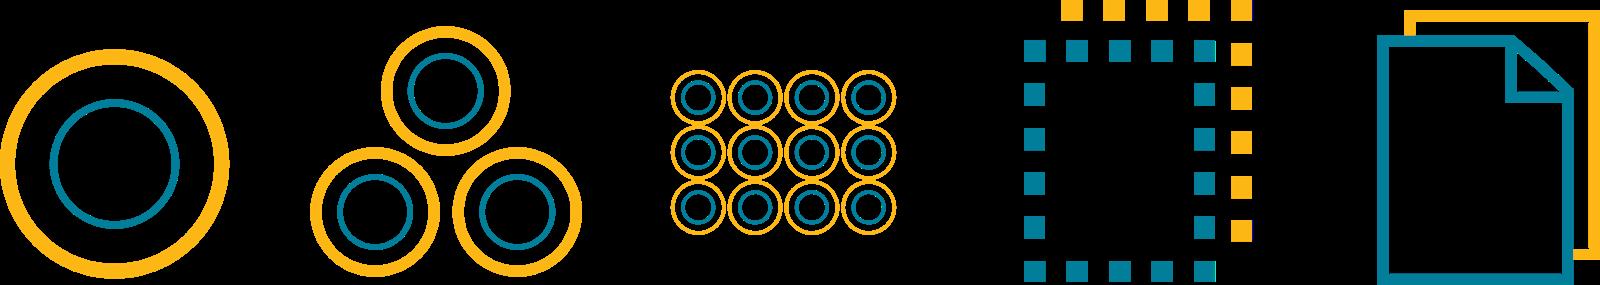 atomic design circular molecules